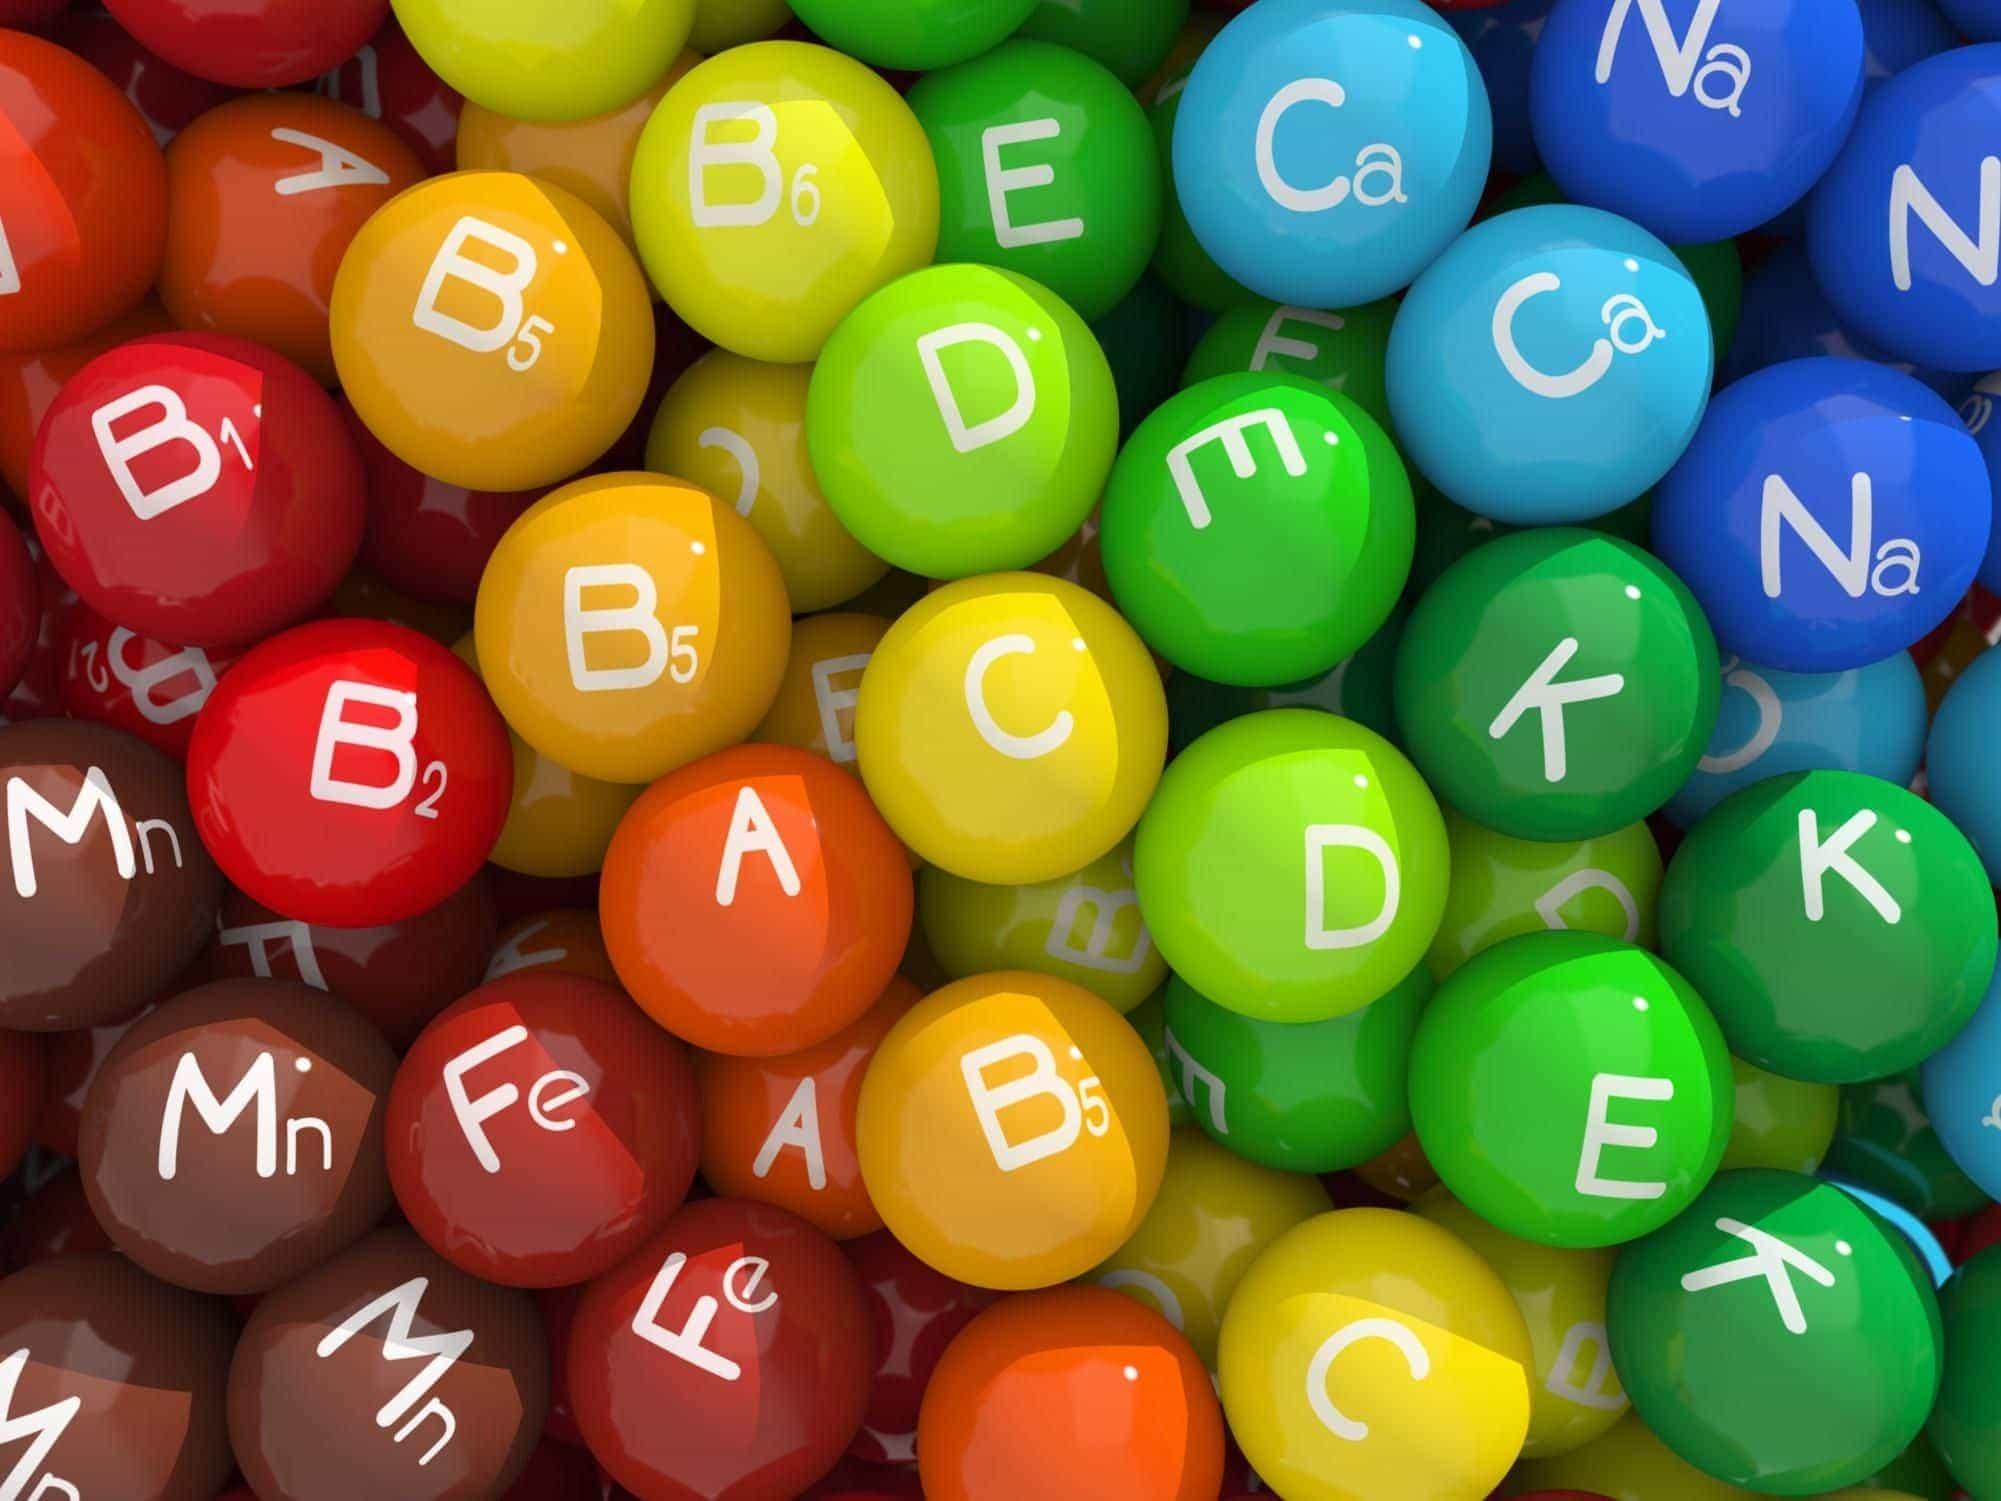 vitamins dream meaning, dream about vitamins, vitamins dream interpretation, seeing in a dream vitamins